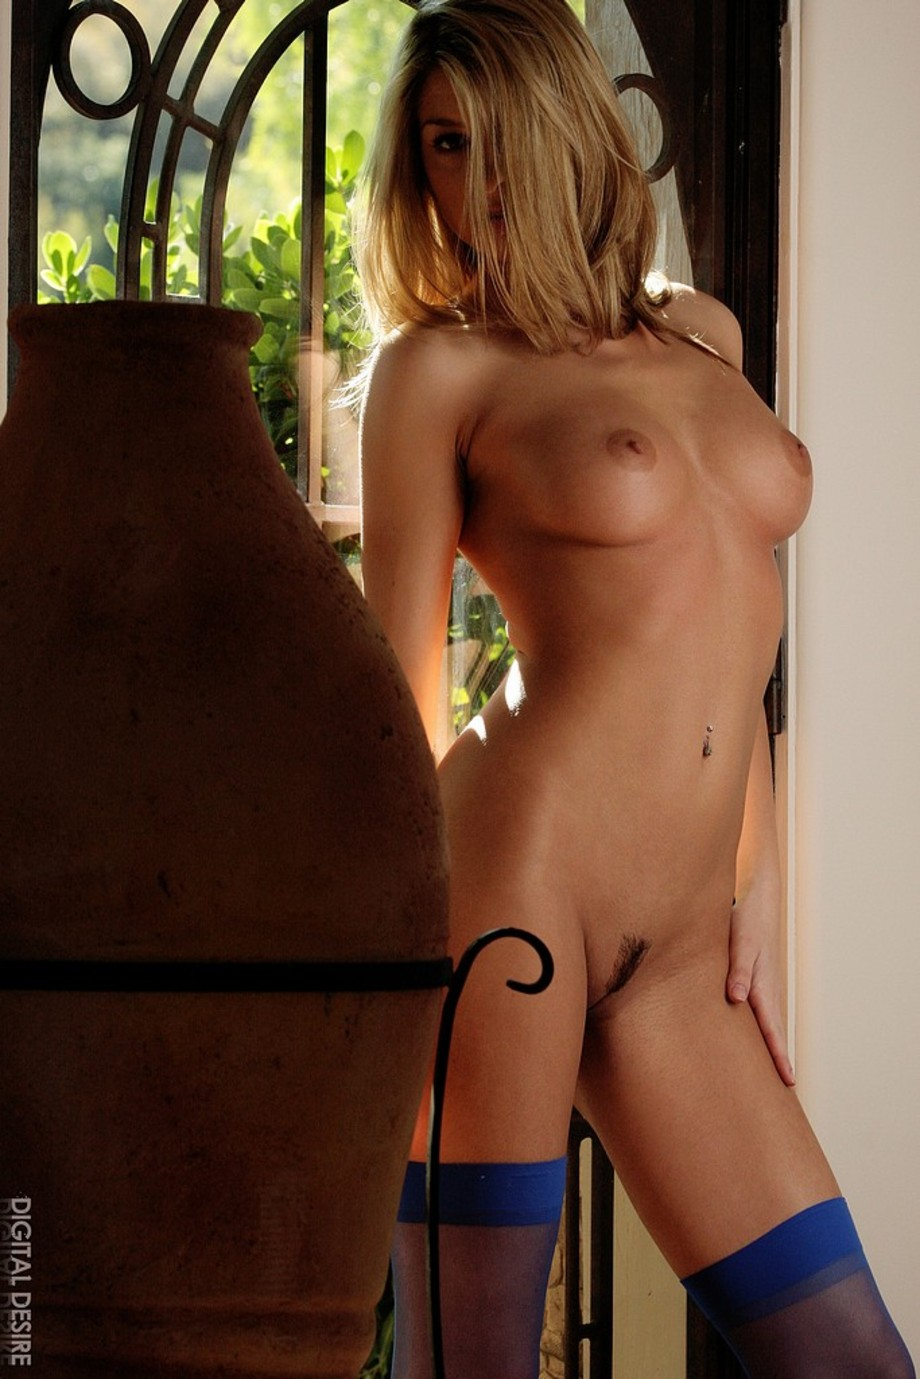 Gta 5 naked girl mod nude scene